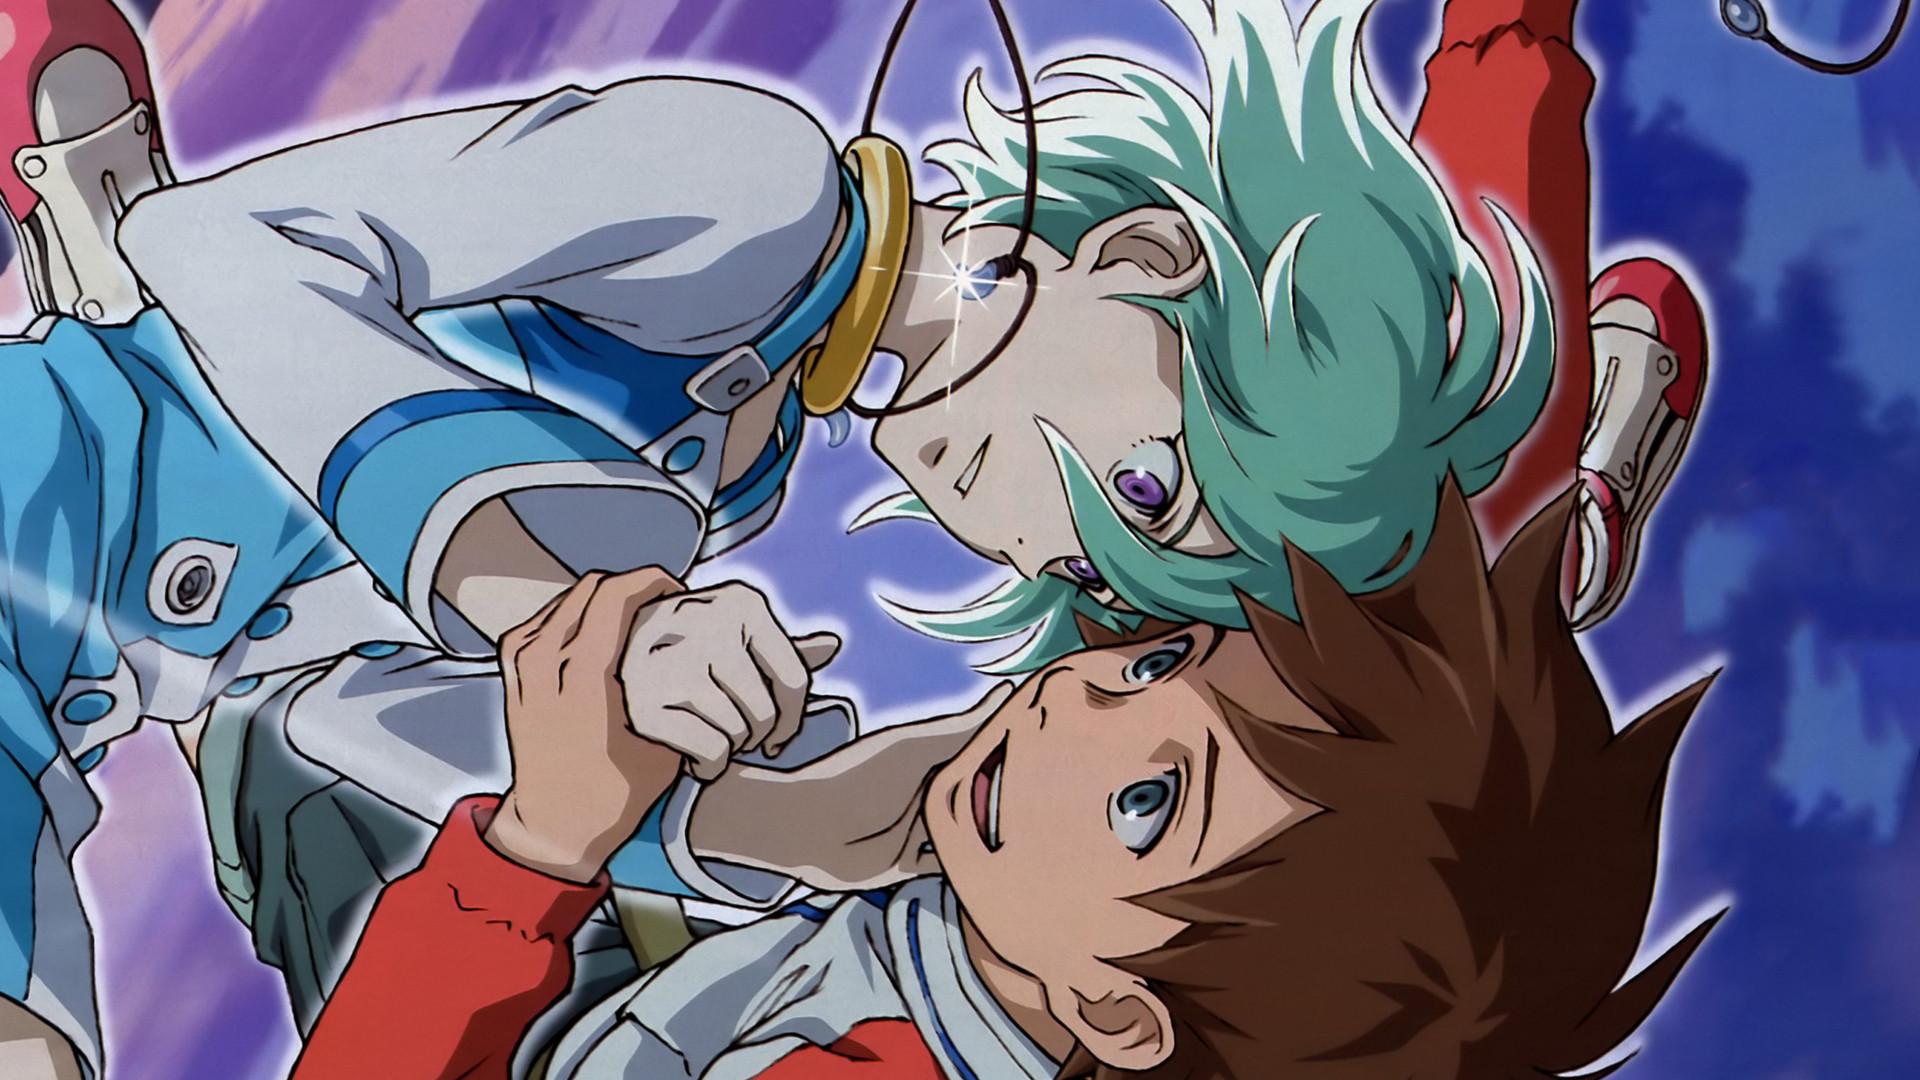 Eureka 7 anime downloads